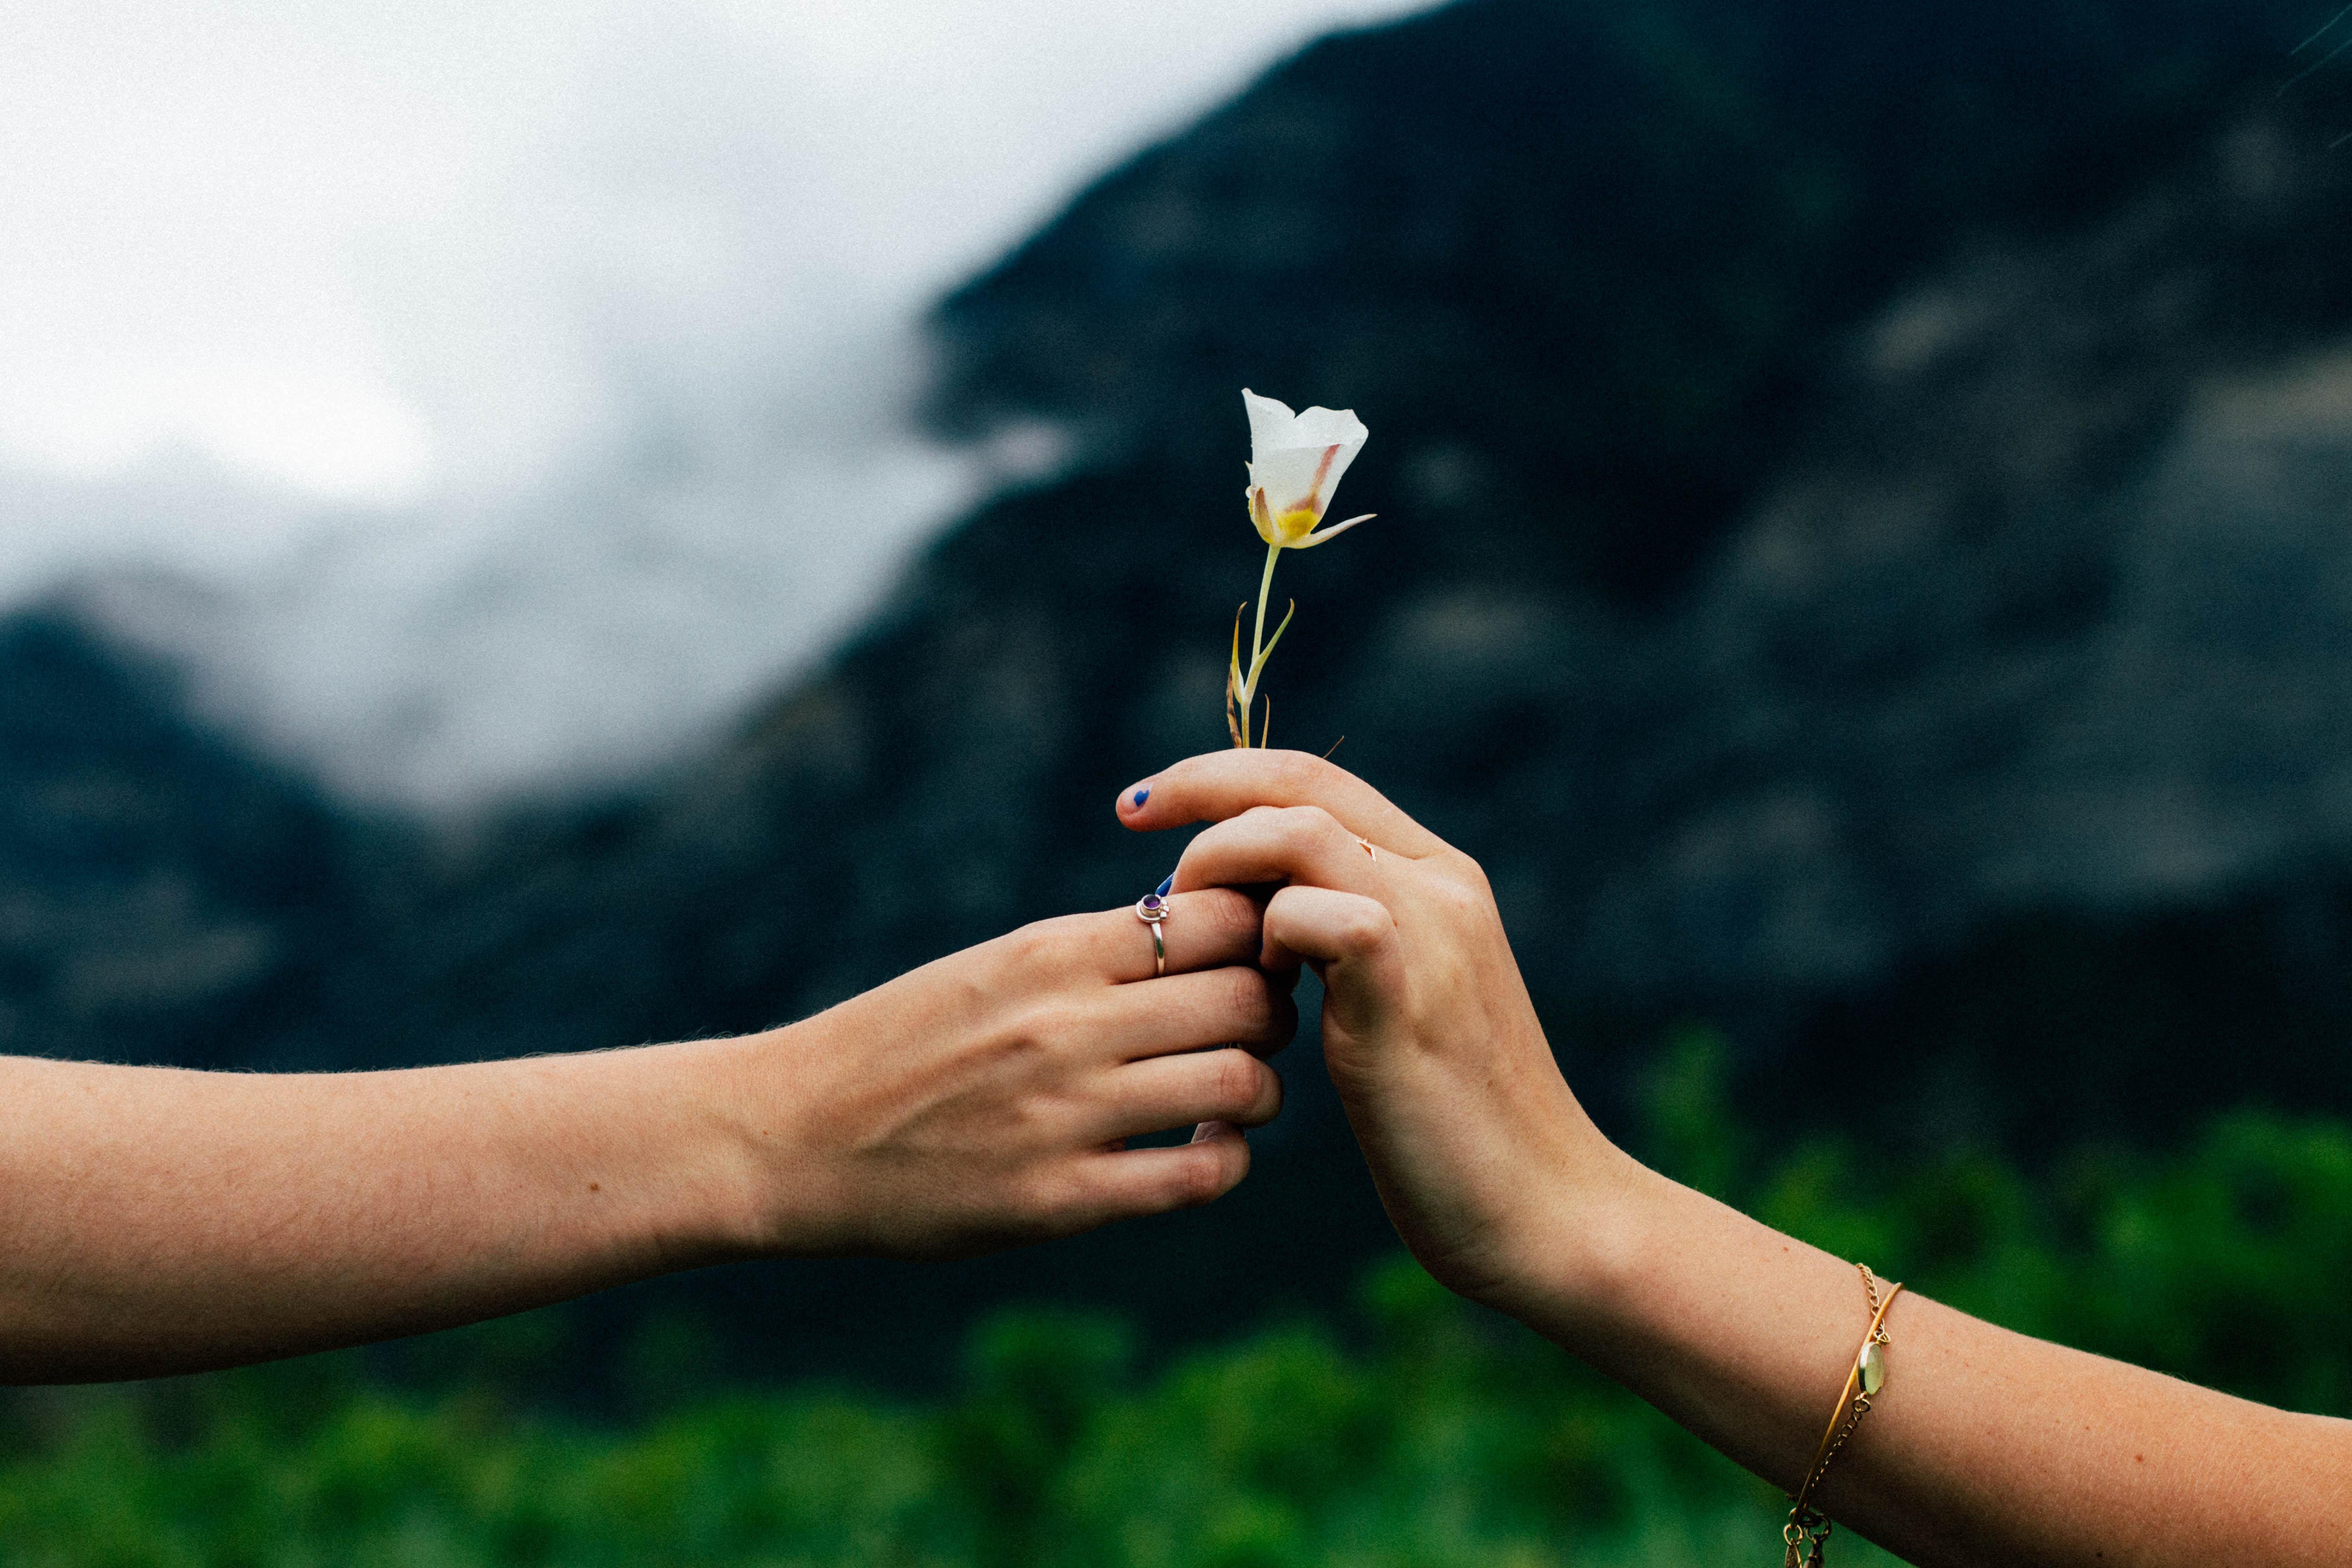 hands giving flower